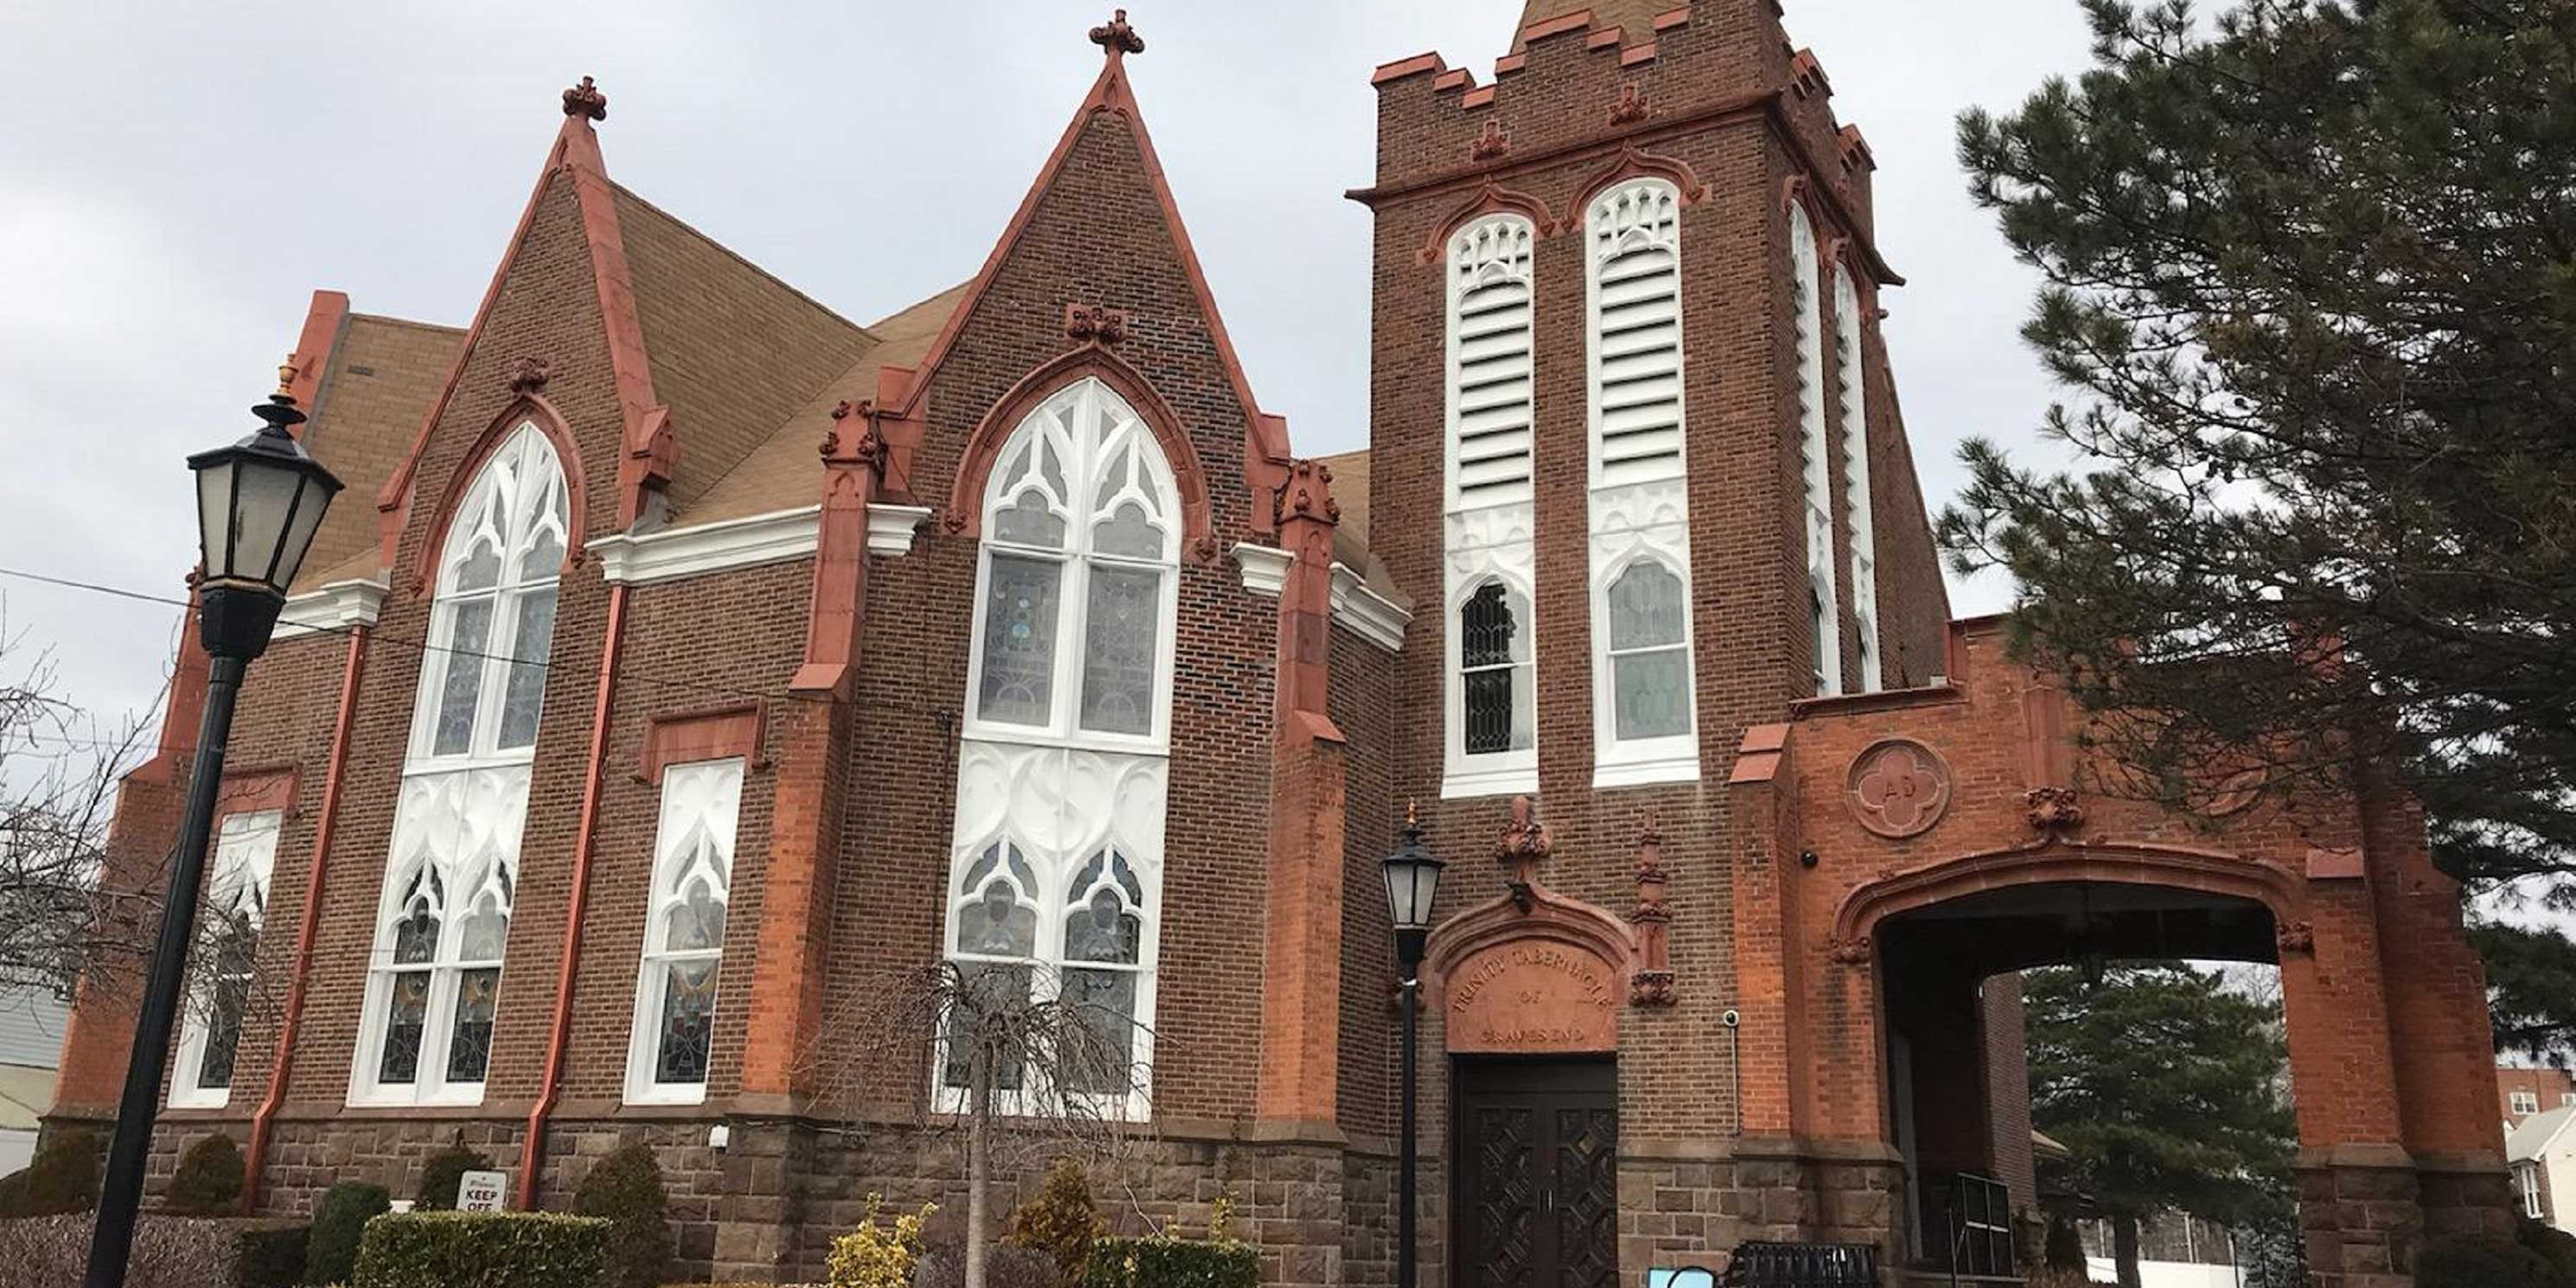 outside of church in Gravesend, Brooklyn